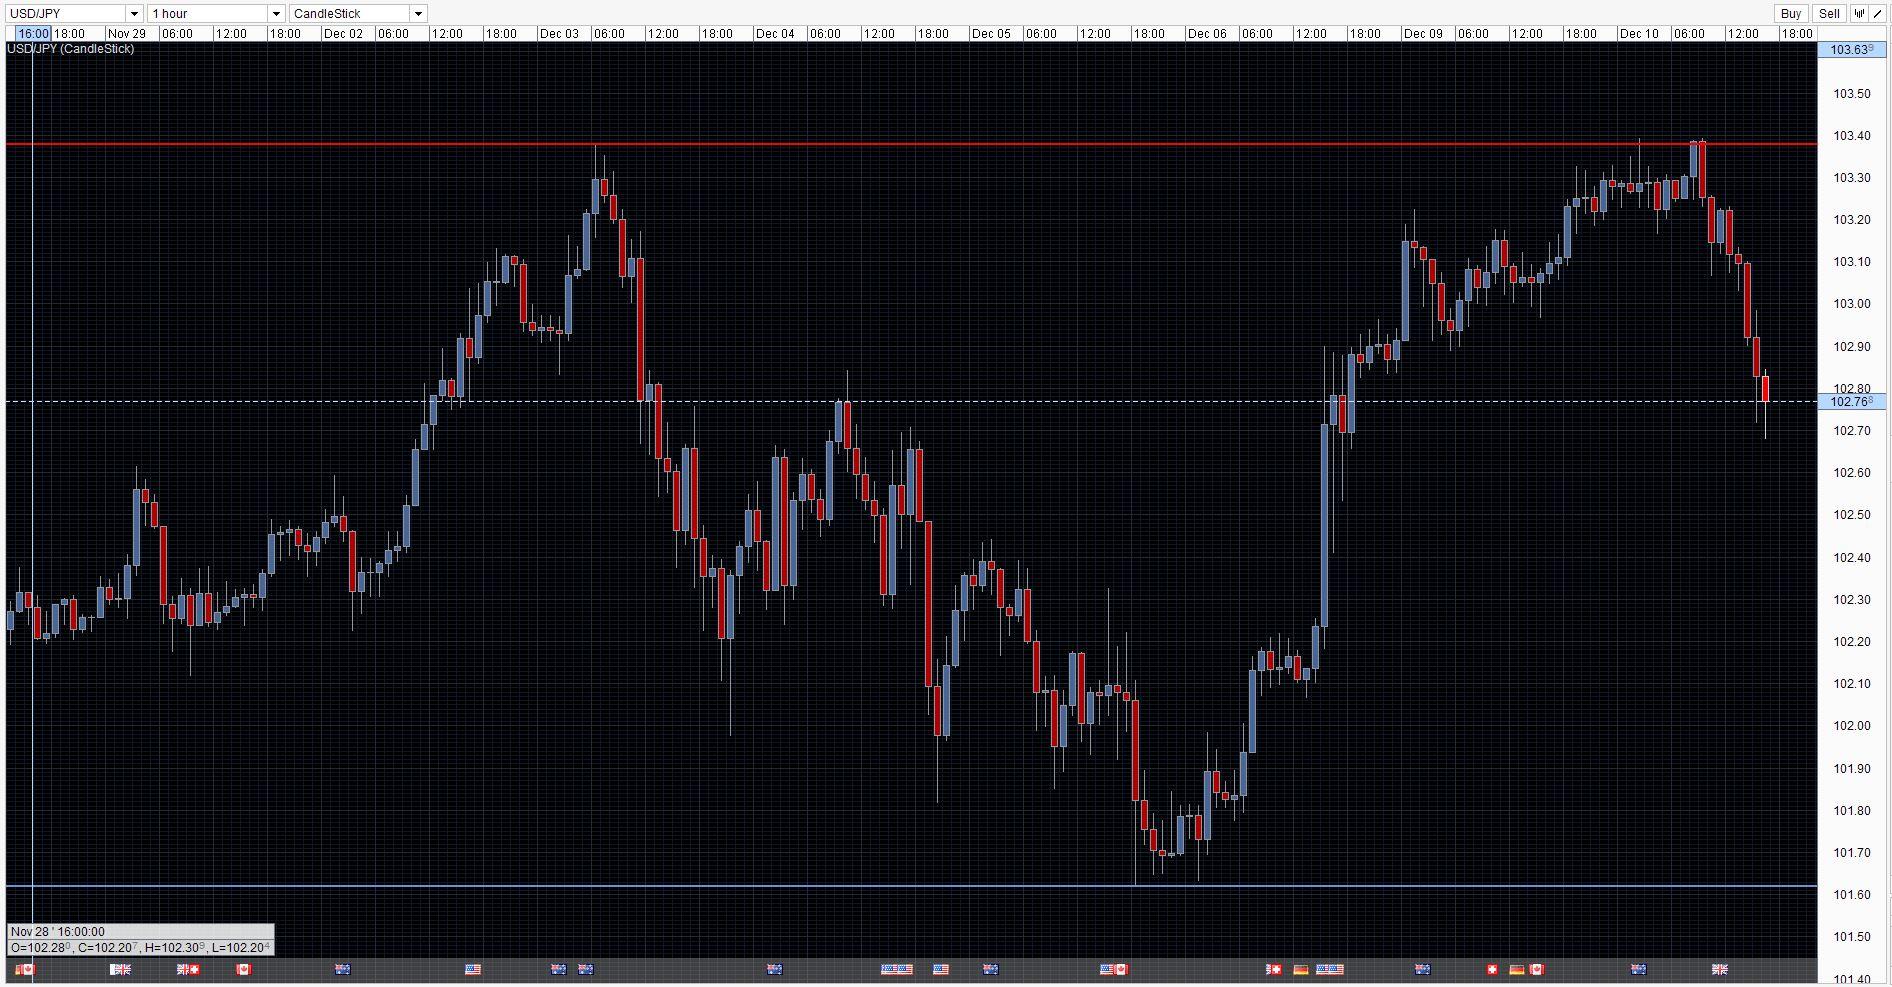 USD/JPY Chart 10/12/2013